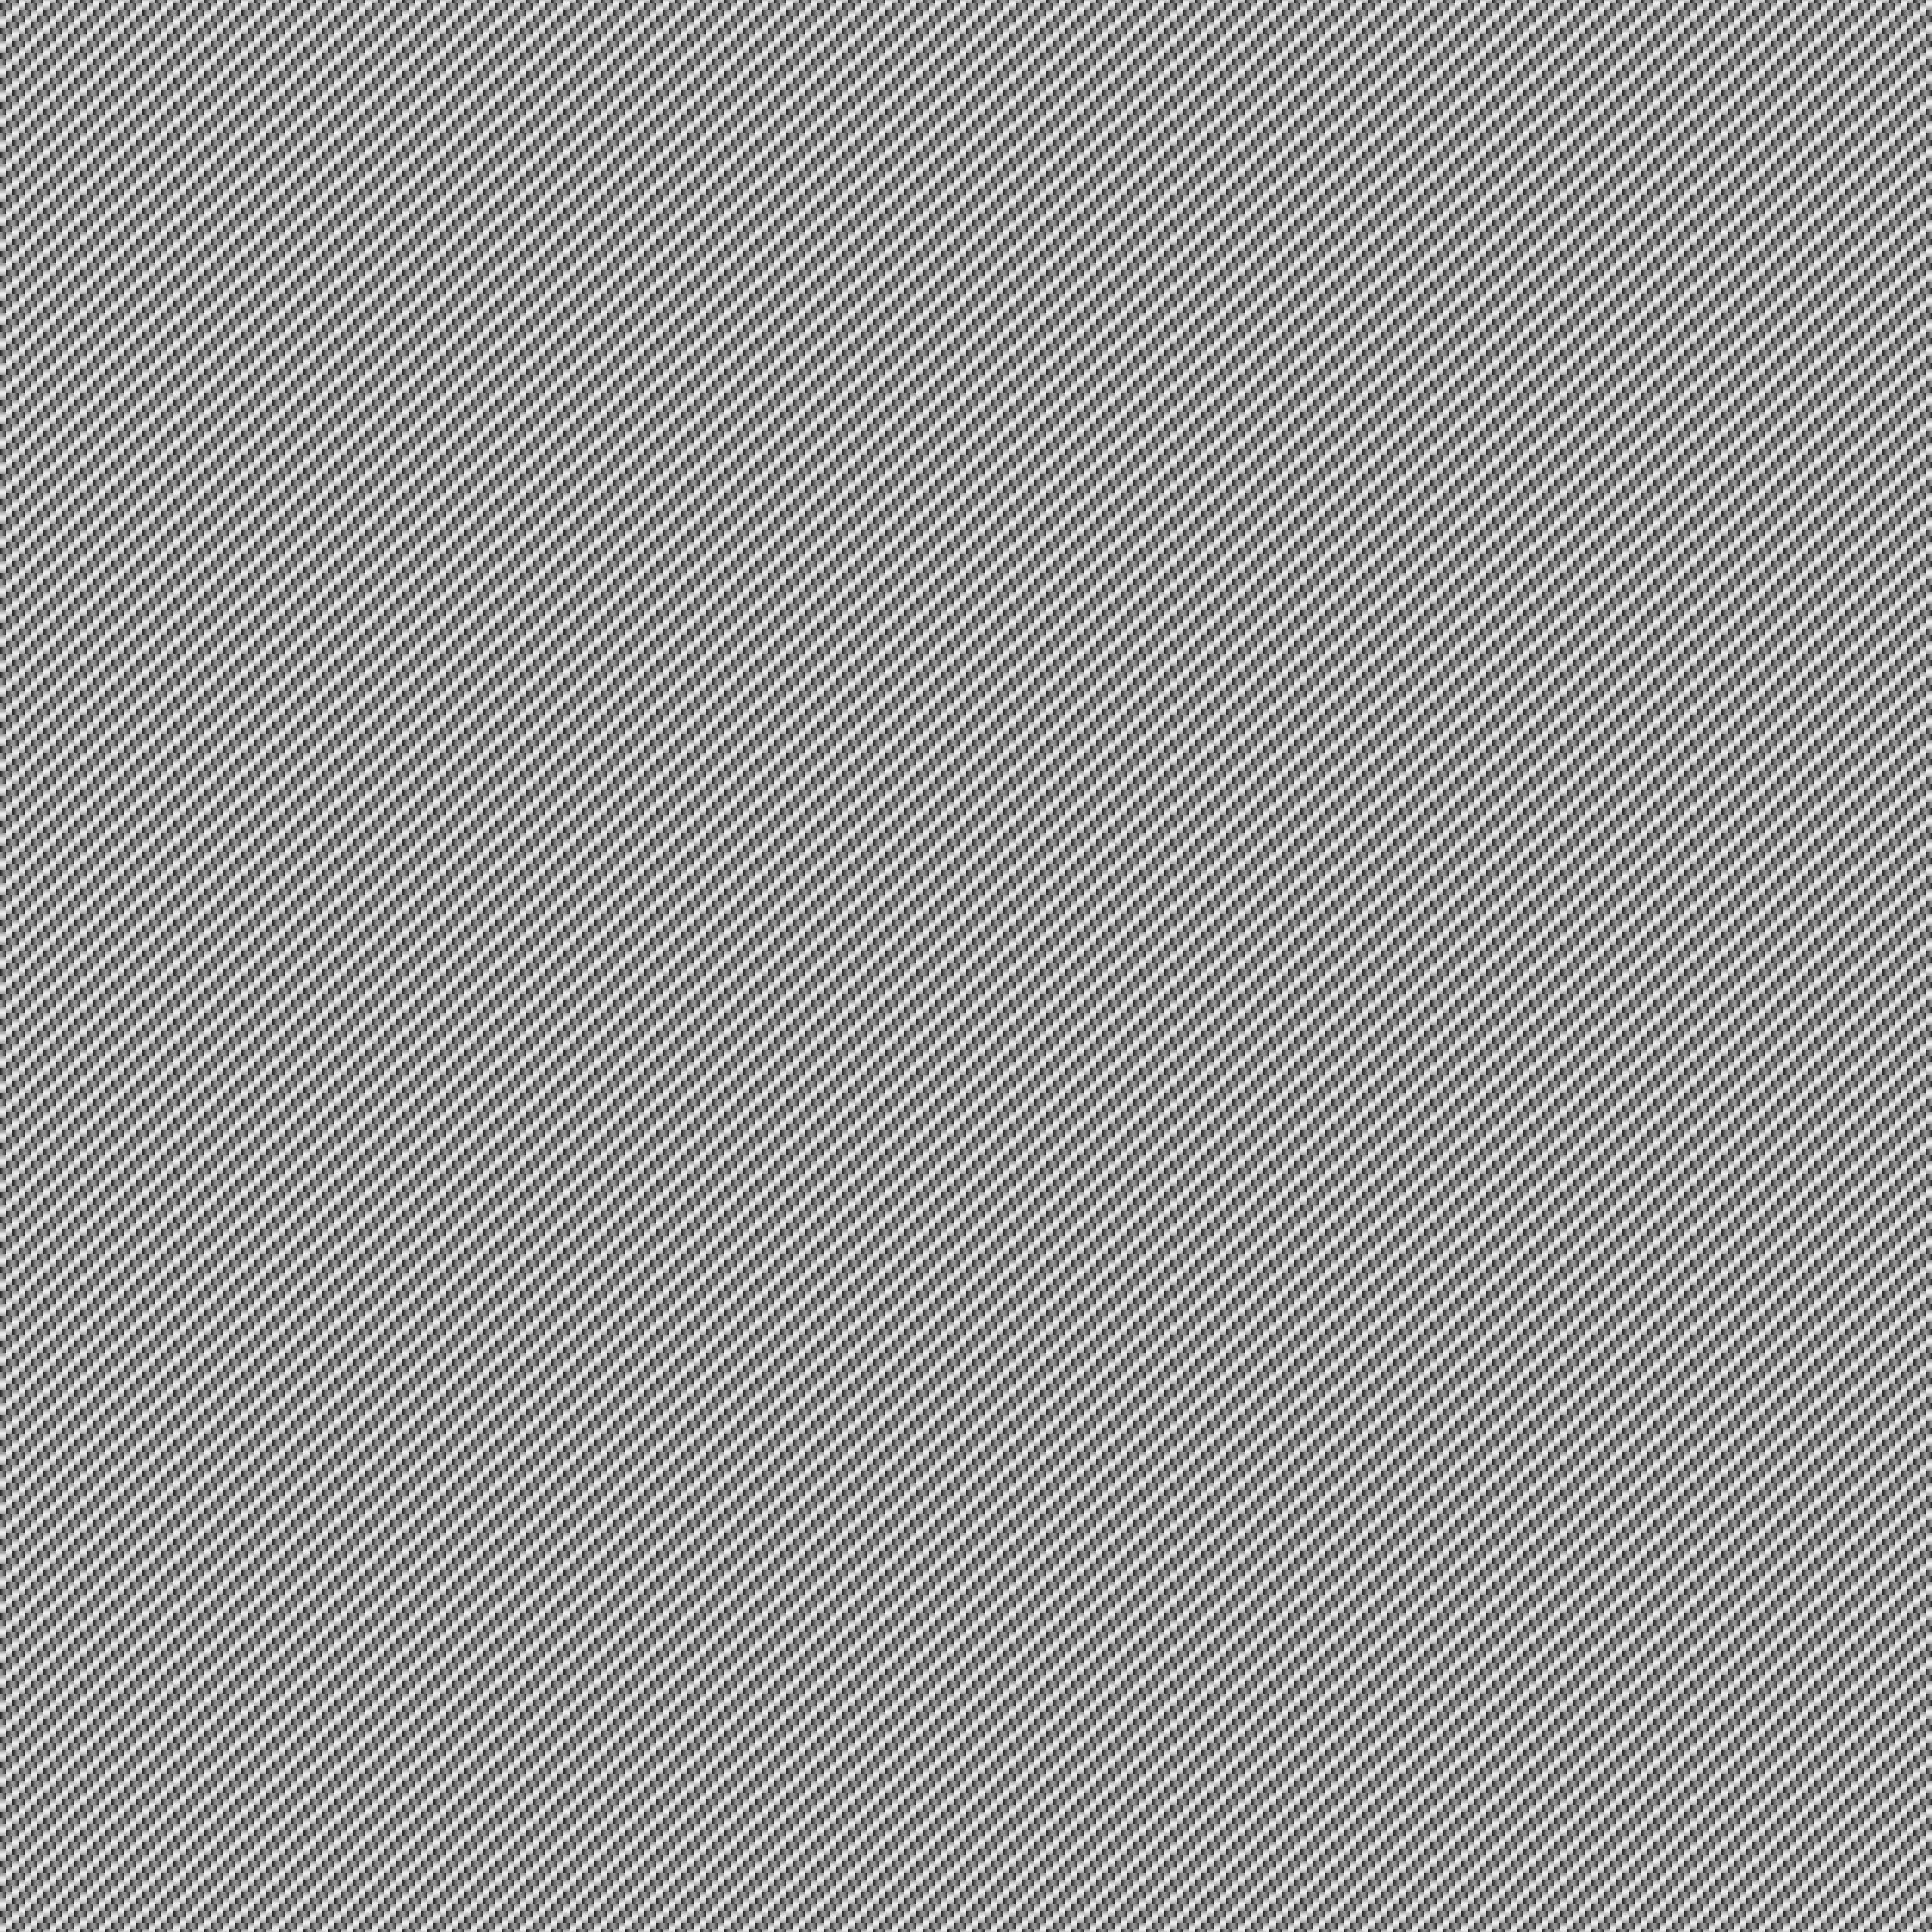 carbon fiber background texture, download background, texture, carbon, carbon fiber, photo